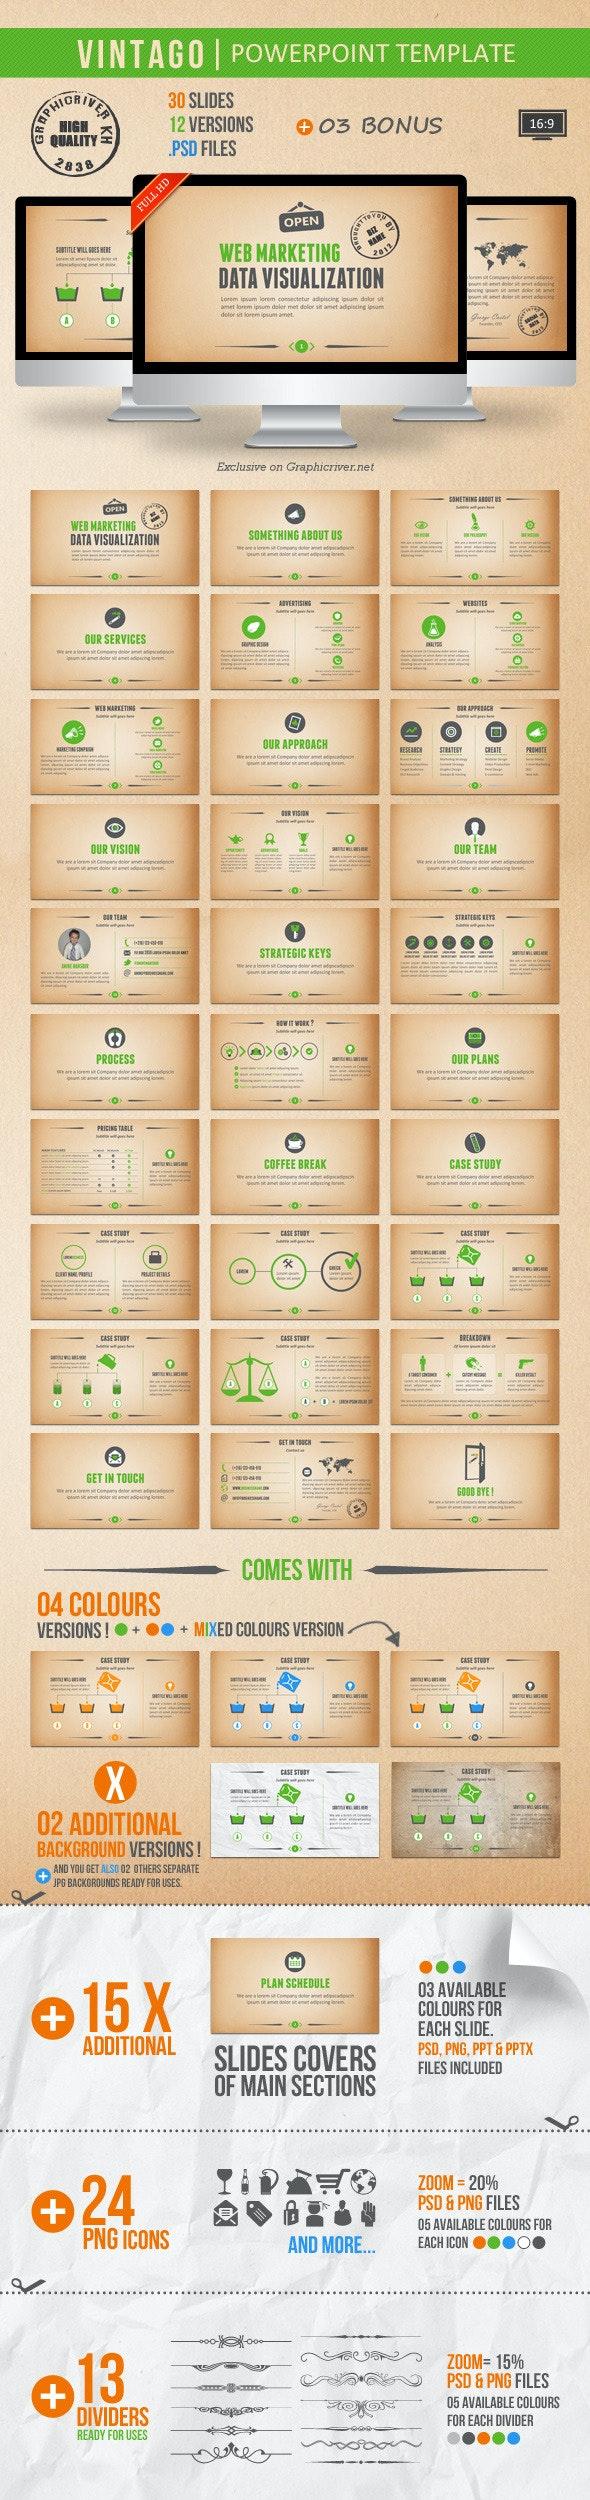 Vintago Powerpoint Template - Creative PowerPoint Templates